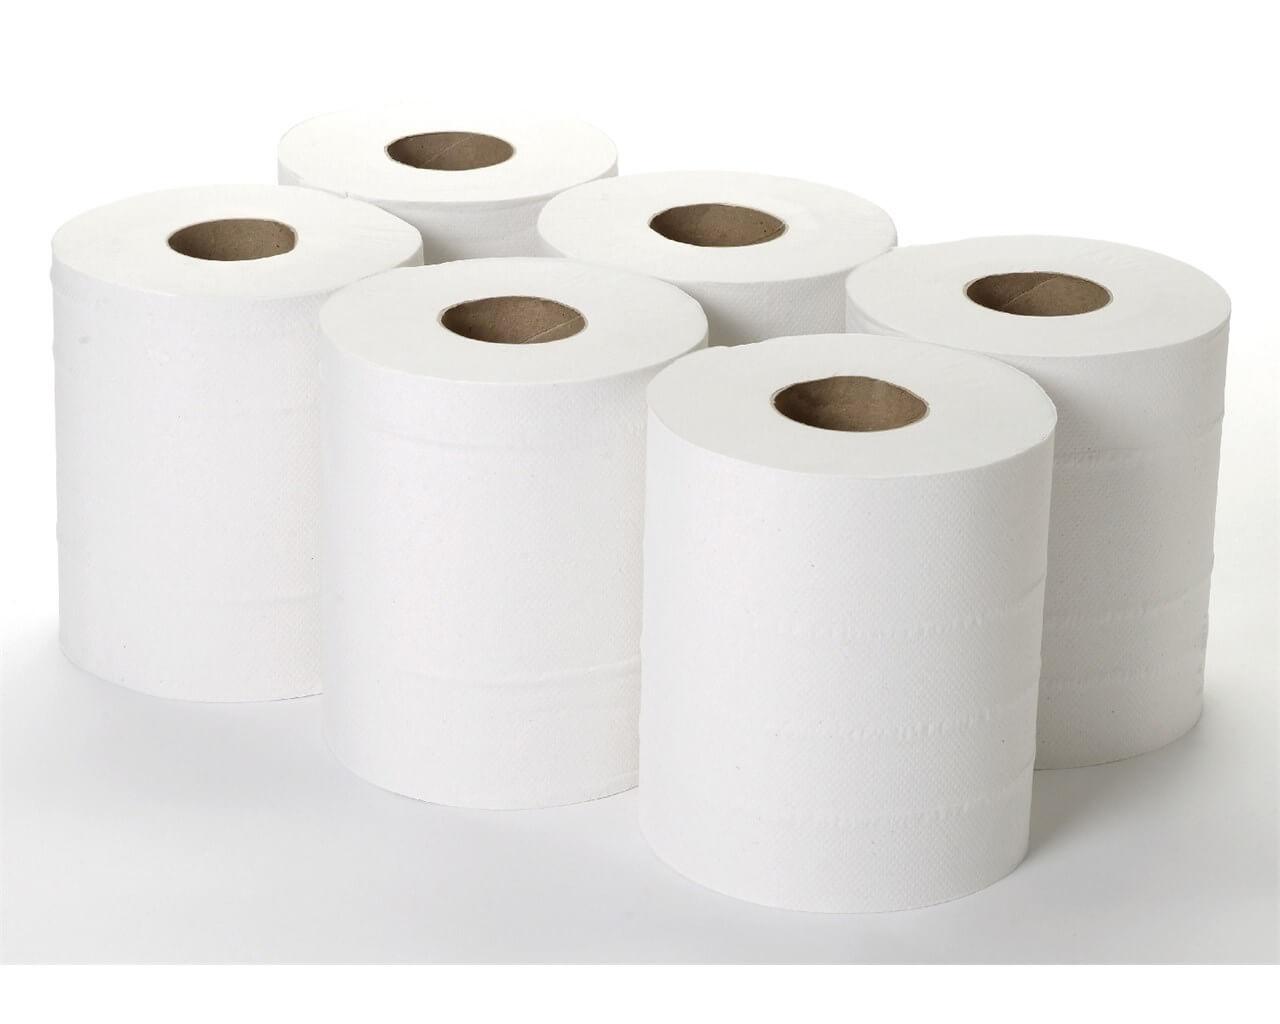 Maxi Tissue Roll Manufacturer in UAE | Paper Link